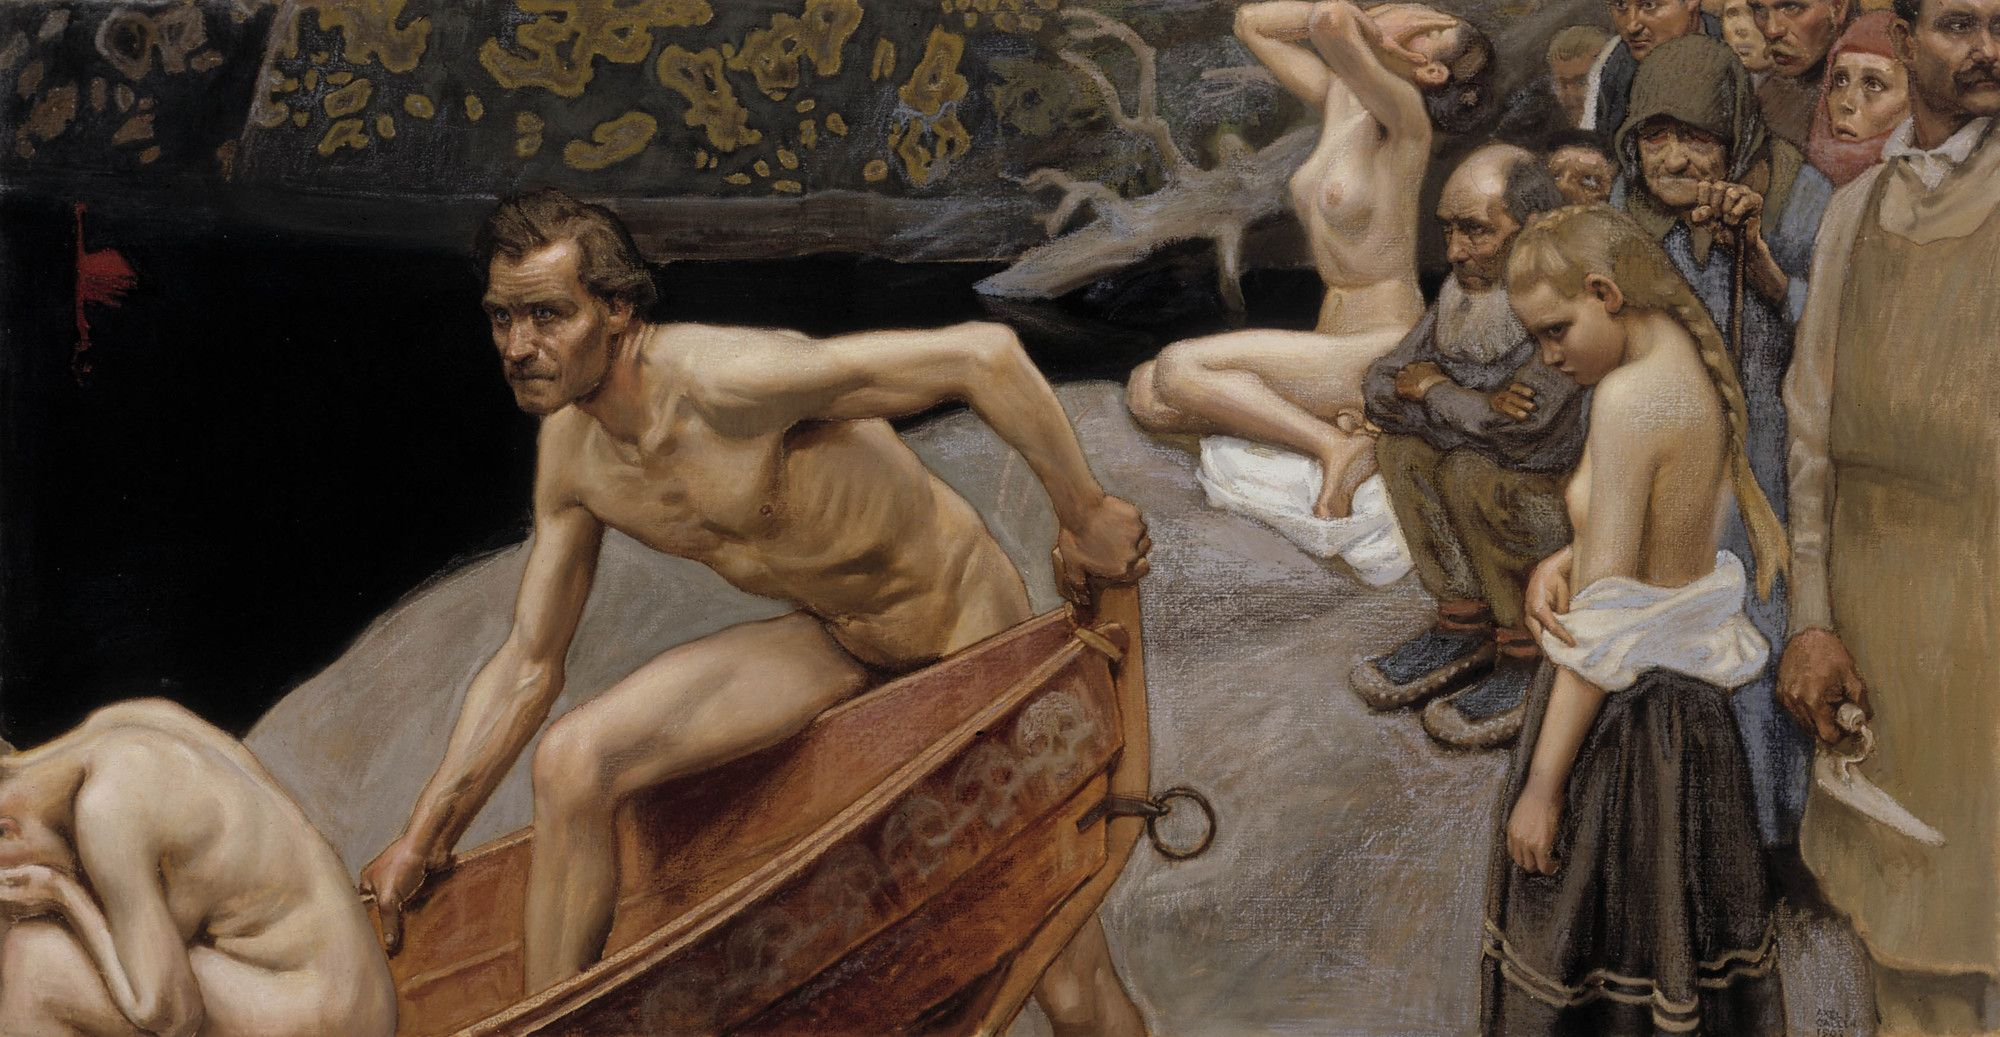 Akseli Gallen-Kallela, By the River of Tuonela, study for the Jusélius Mausoleum frescos, 1903, tempera on canvas